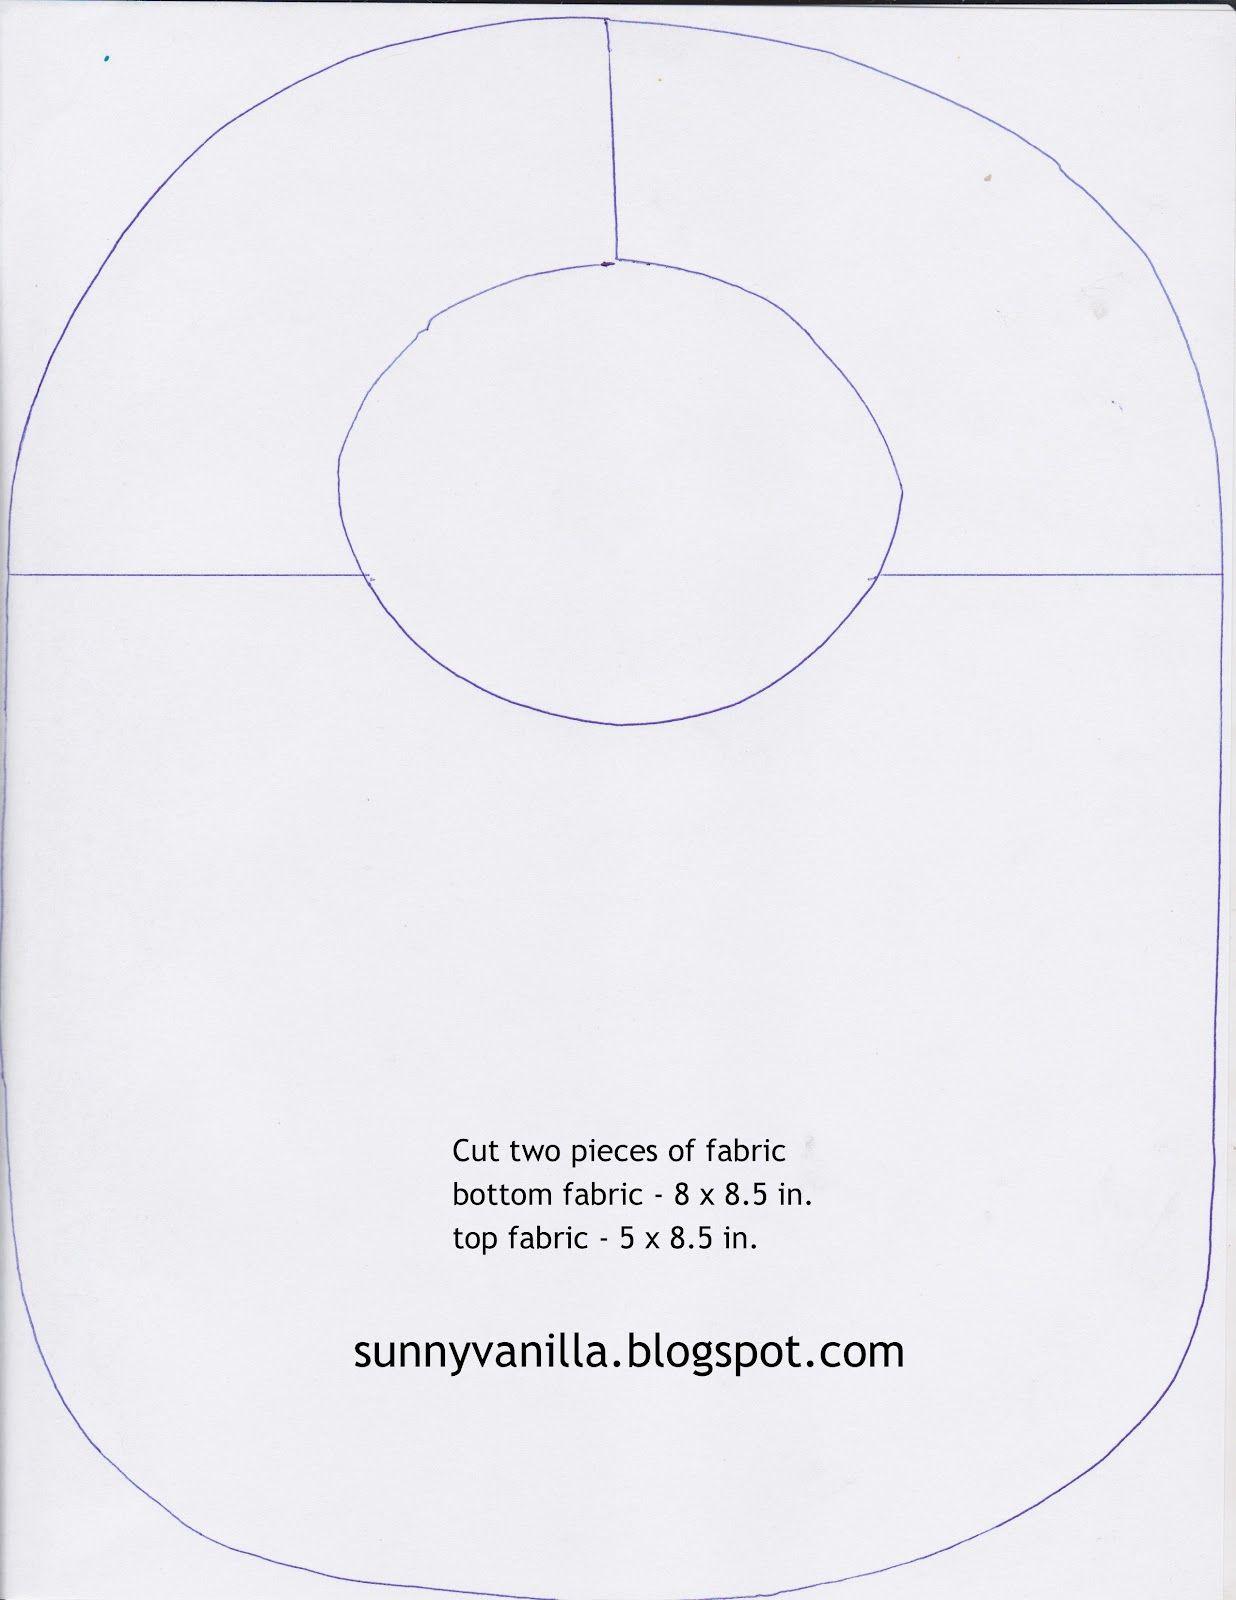 Sunny Vanilla: How to sew a bib + FREE pattern | ~ SeWiNg ~ | Pinterest